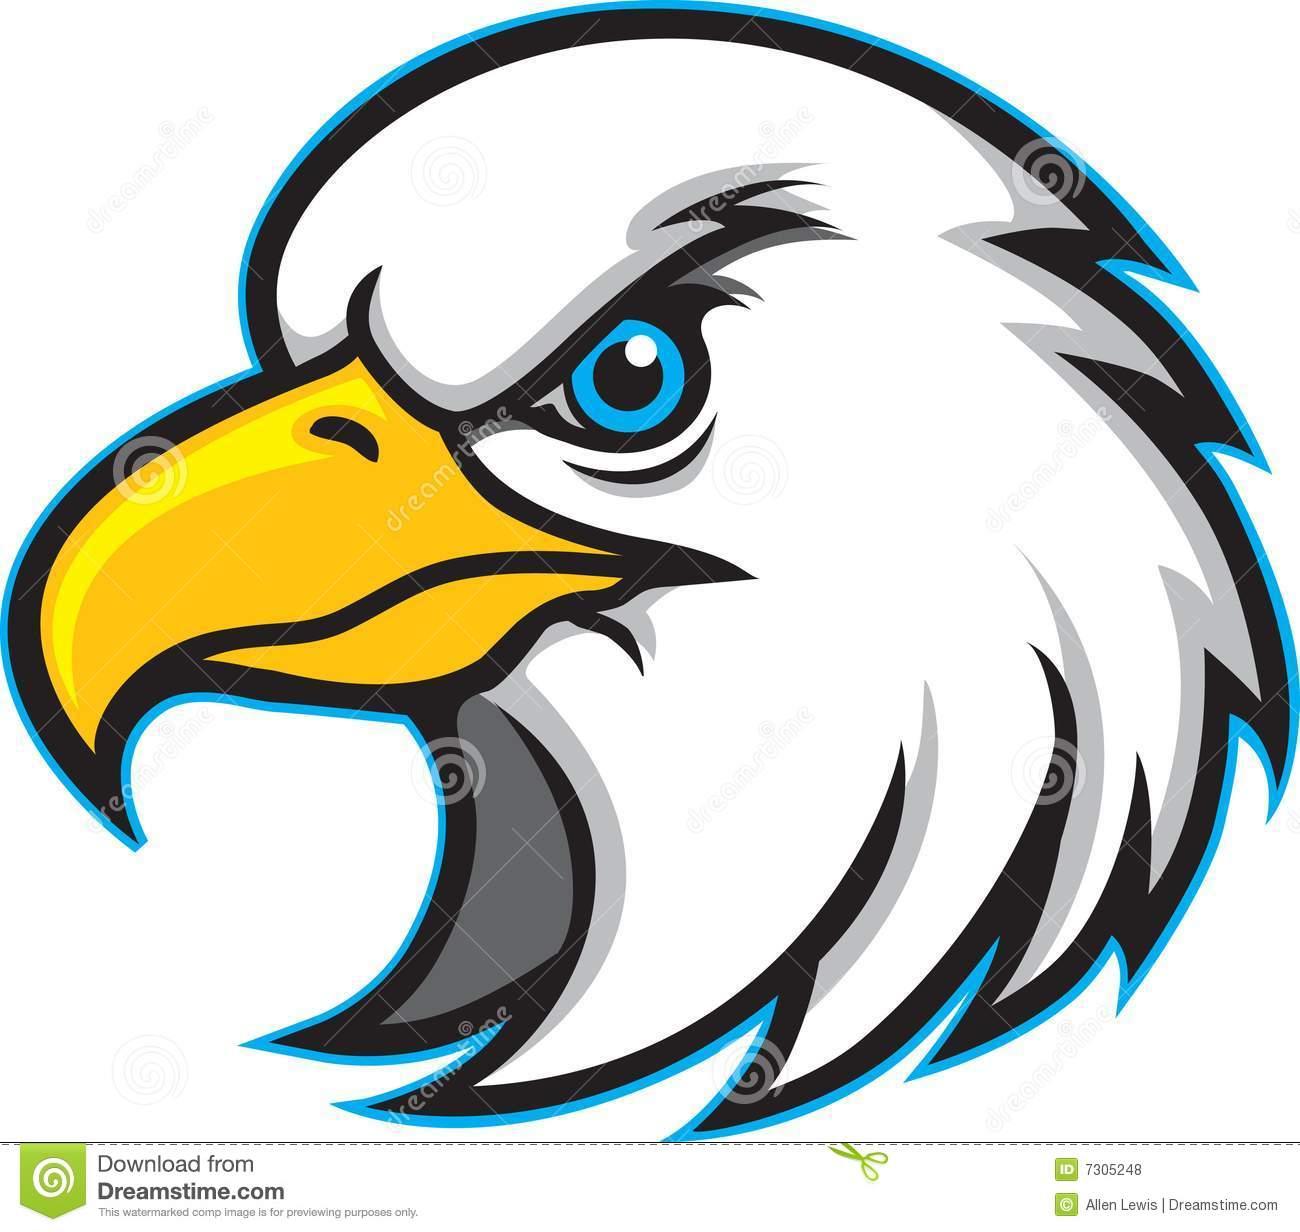 Beak clipart toucan Clipart Eagle Download Logo Mascot